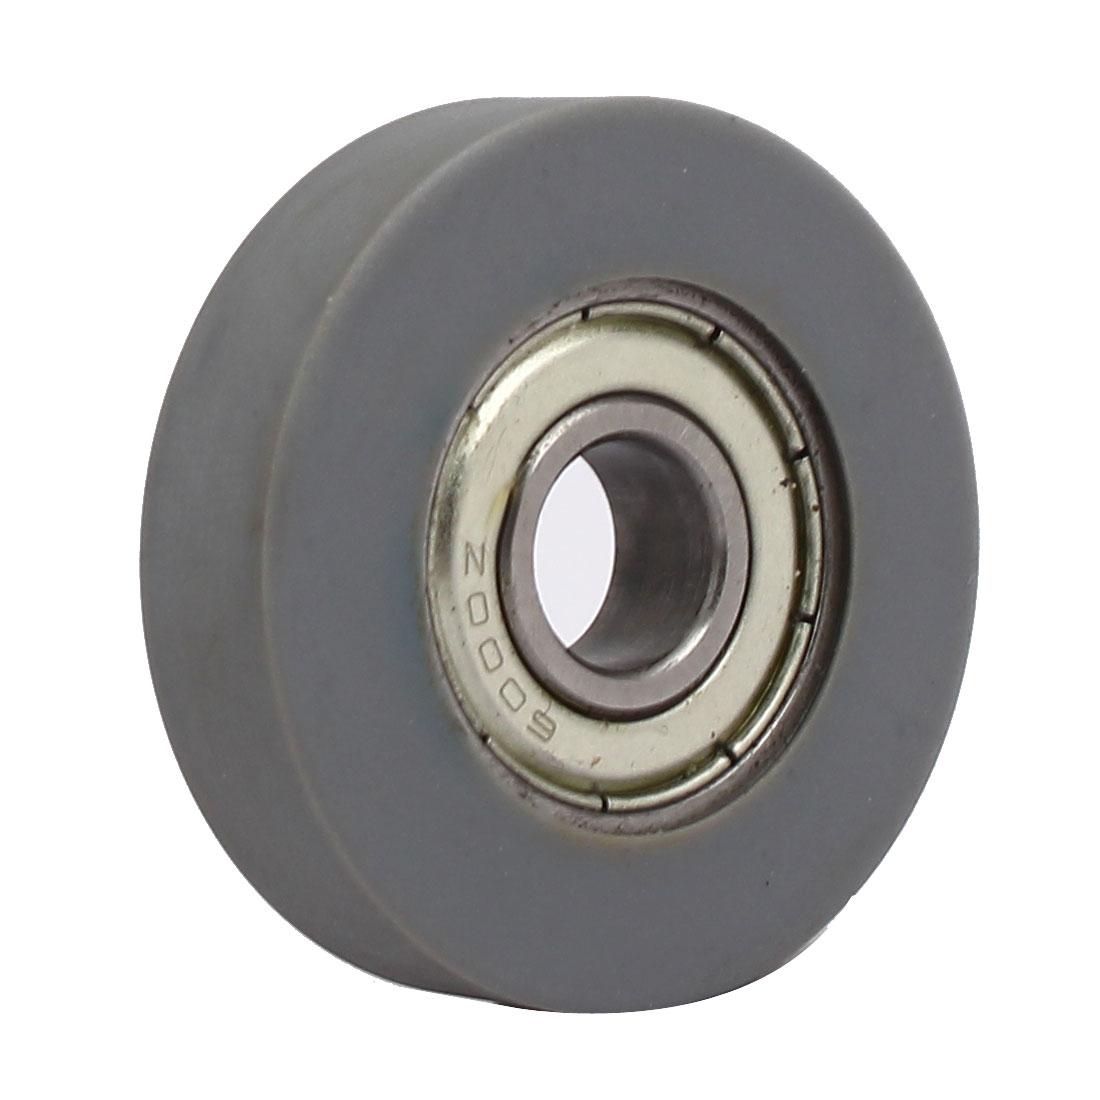 10mm x 40mm x 10mm PU Roller Bearing Pulley Sliding Conveyor Wheel